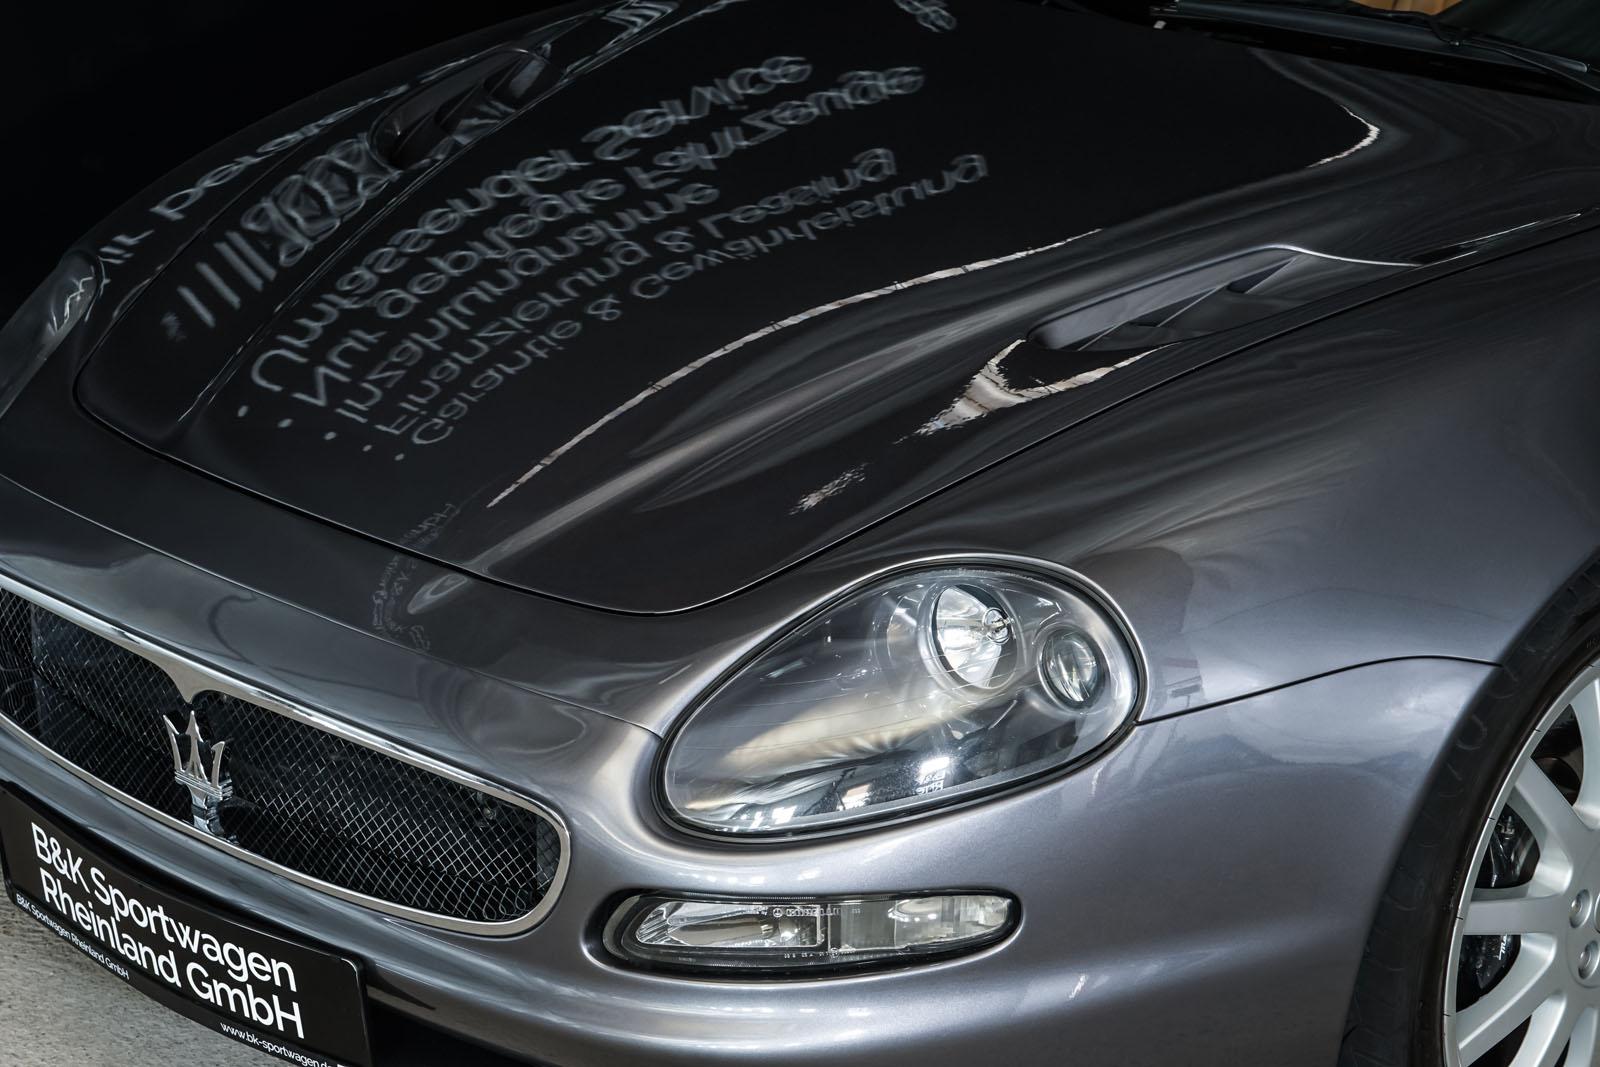 Maserati_3200_GTA_Grau_Beige_MAS-0874_13_w